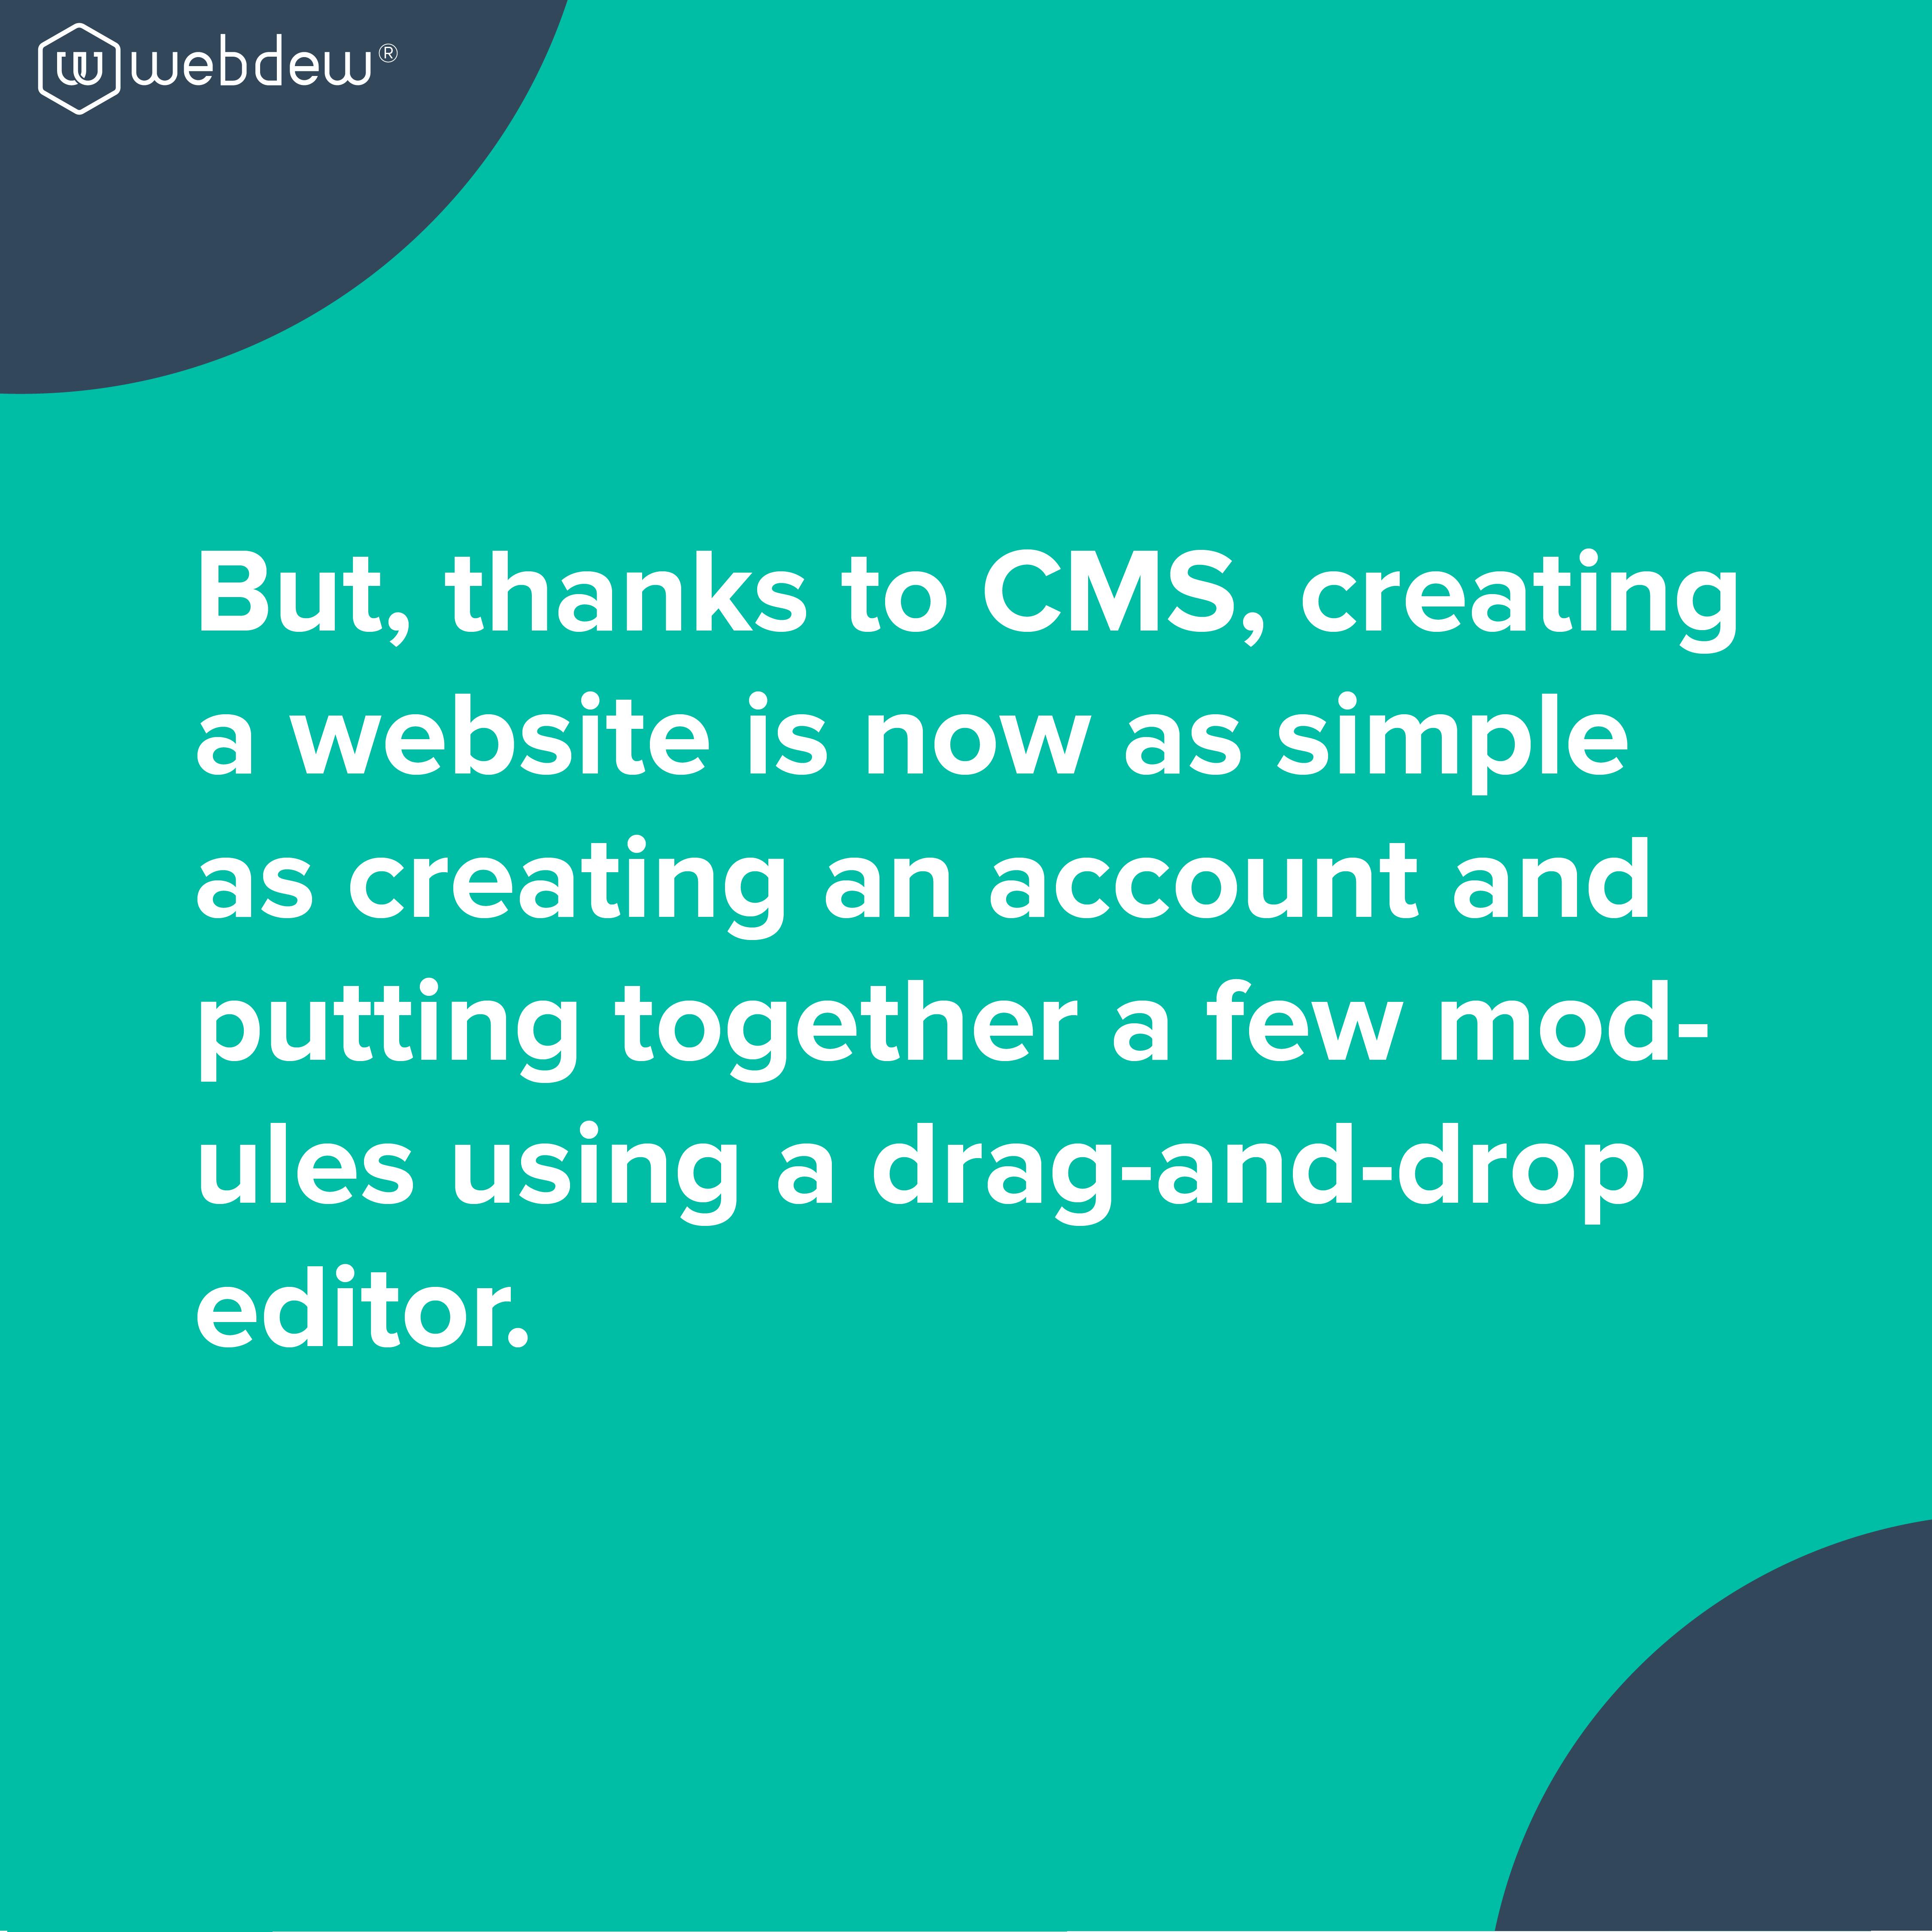 cms-for-easy-web-development